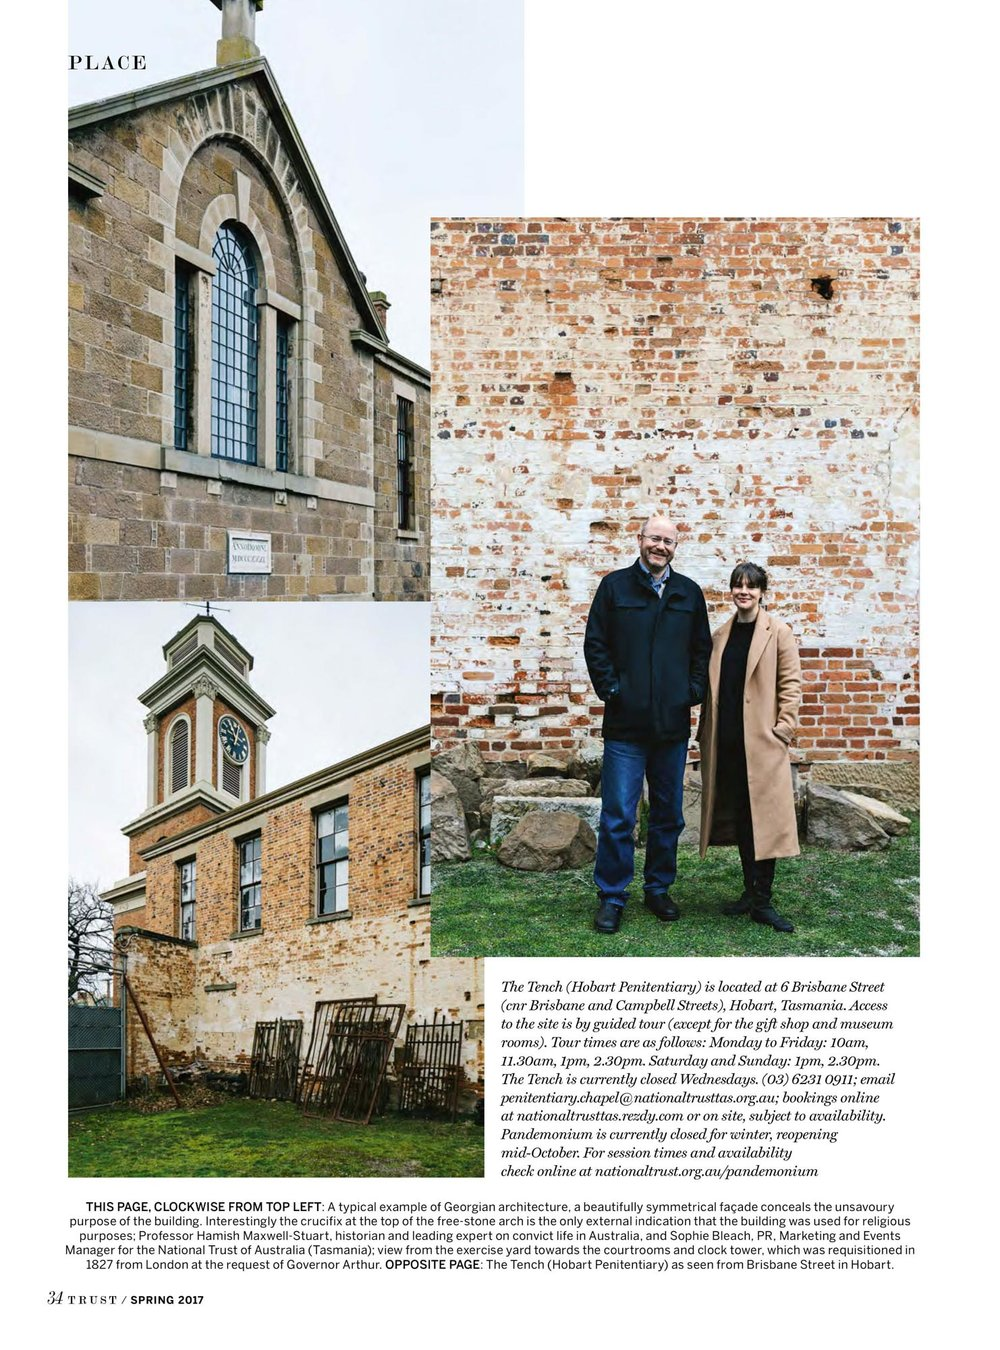 Marnie Hawson, Melbourne lifestyle photographer for Trust magazine, Issue 3 (Hobart Penitentiary)